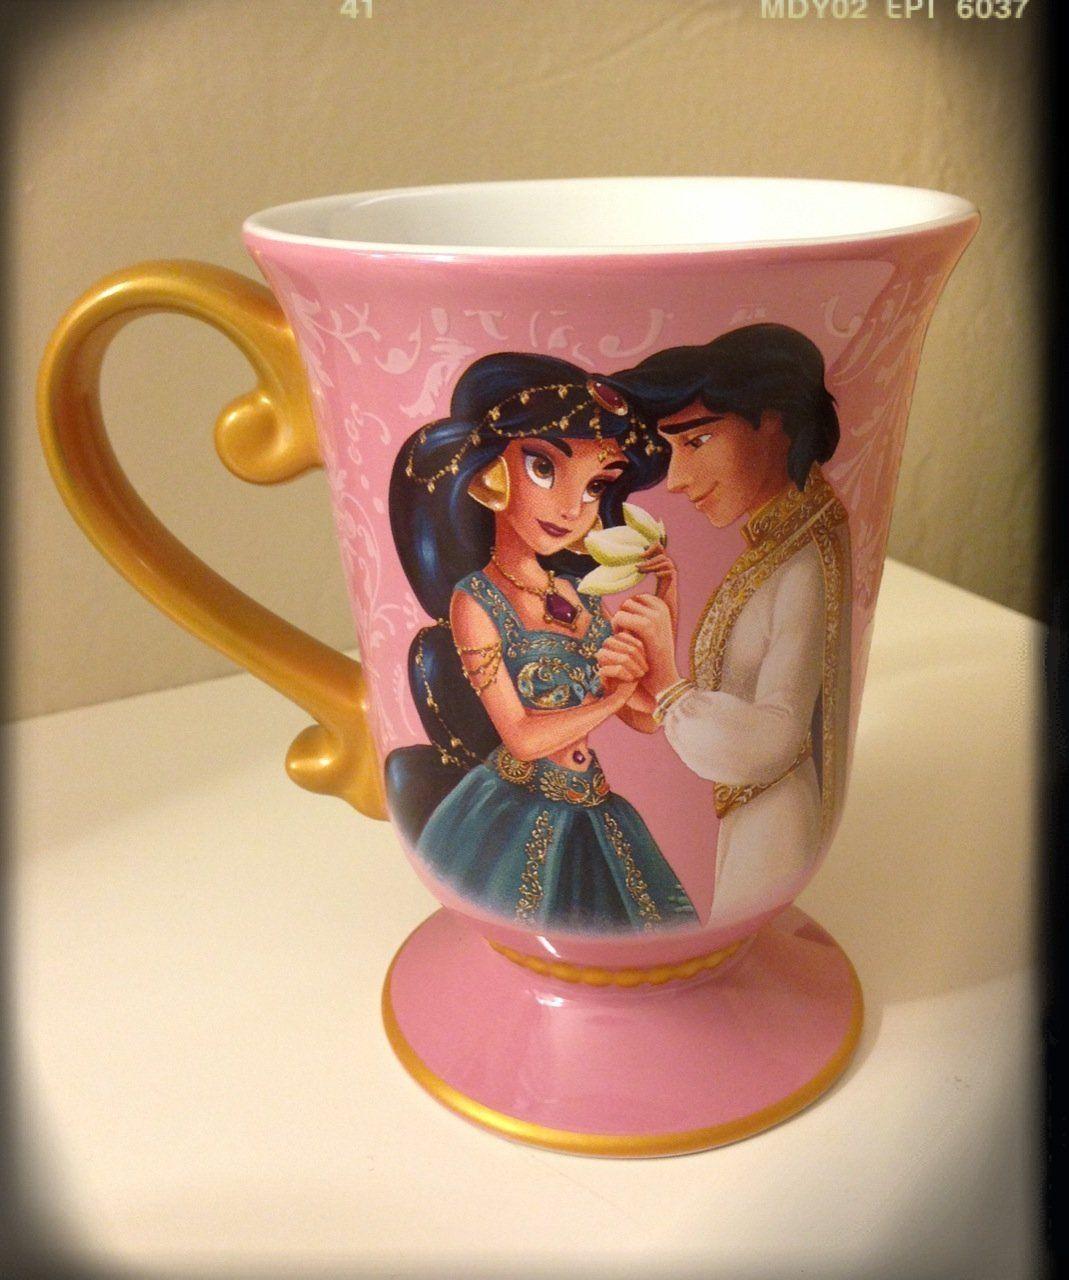 Amazon aladdin coffee mugs - Disney Aladdin Coffee Mugs Are Available Here At Mug Freaks